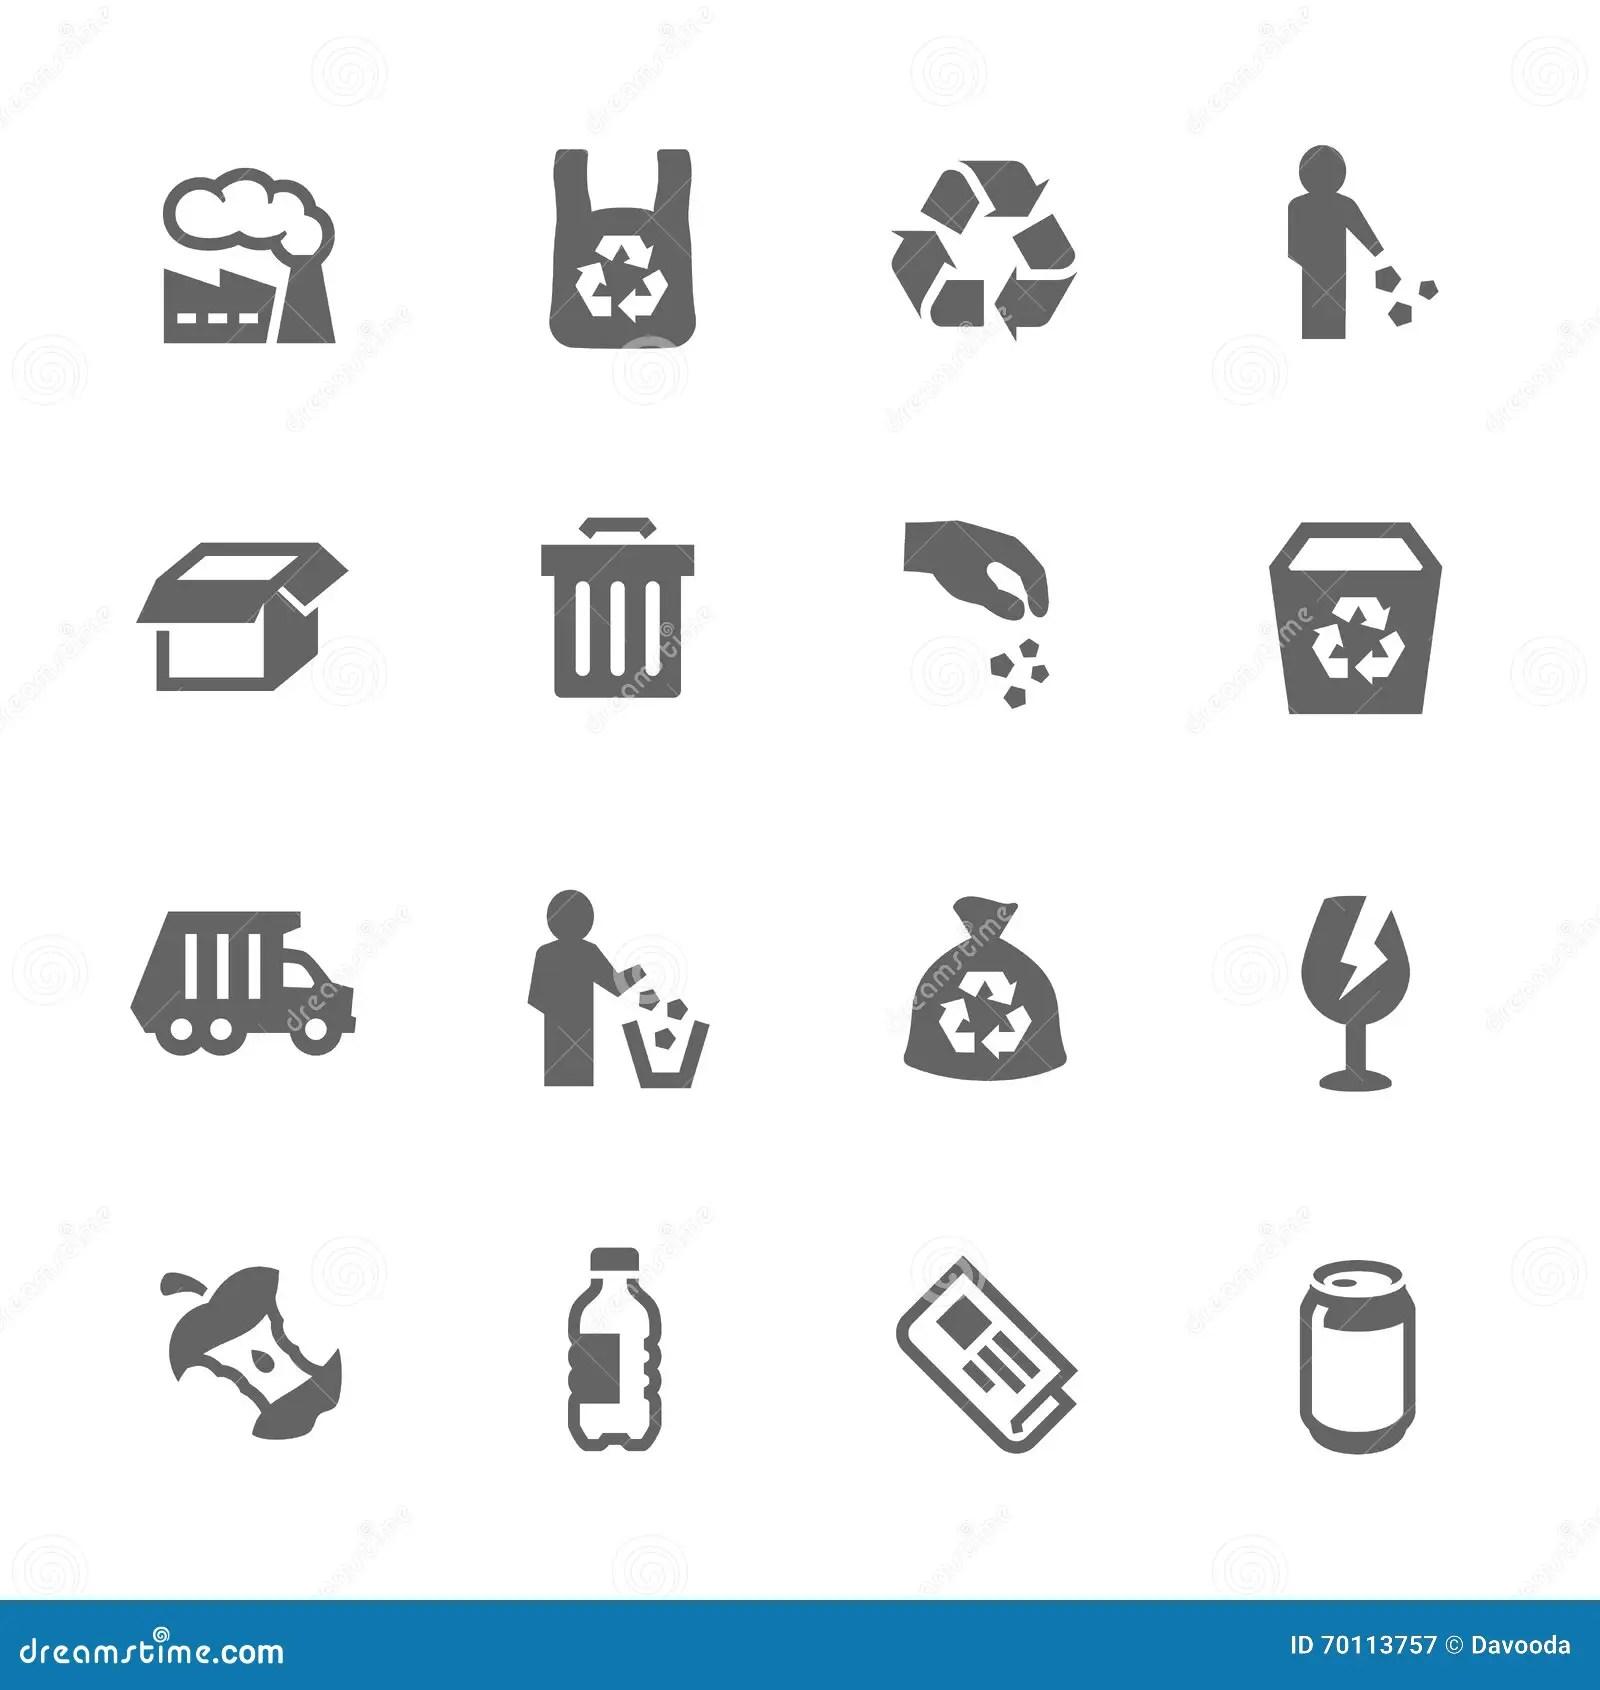 Nicht Spulmaschinengeeignet Symbol